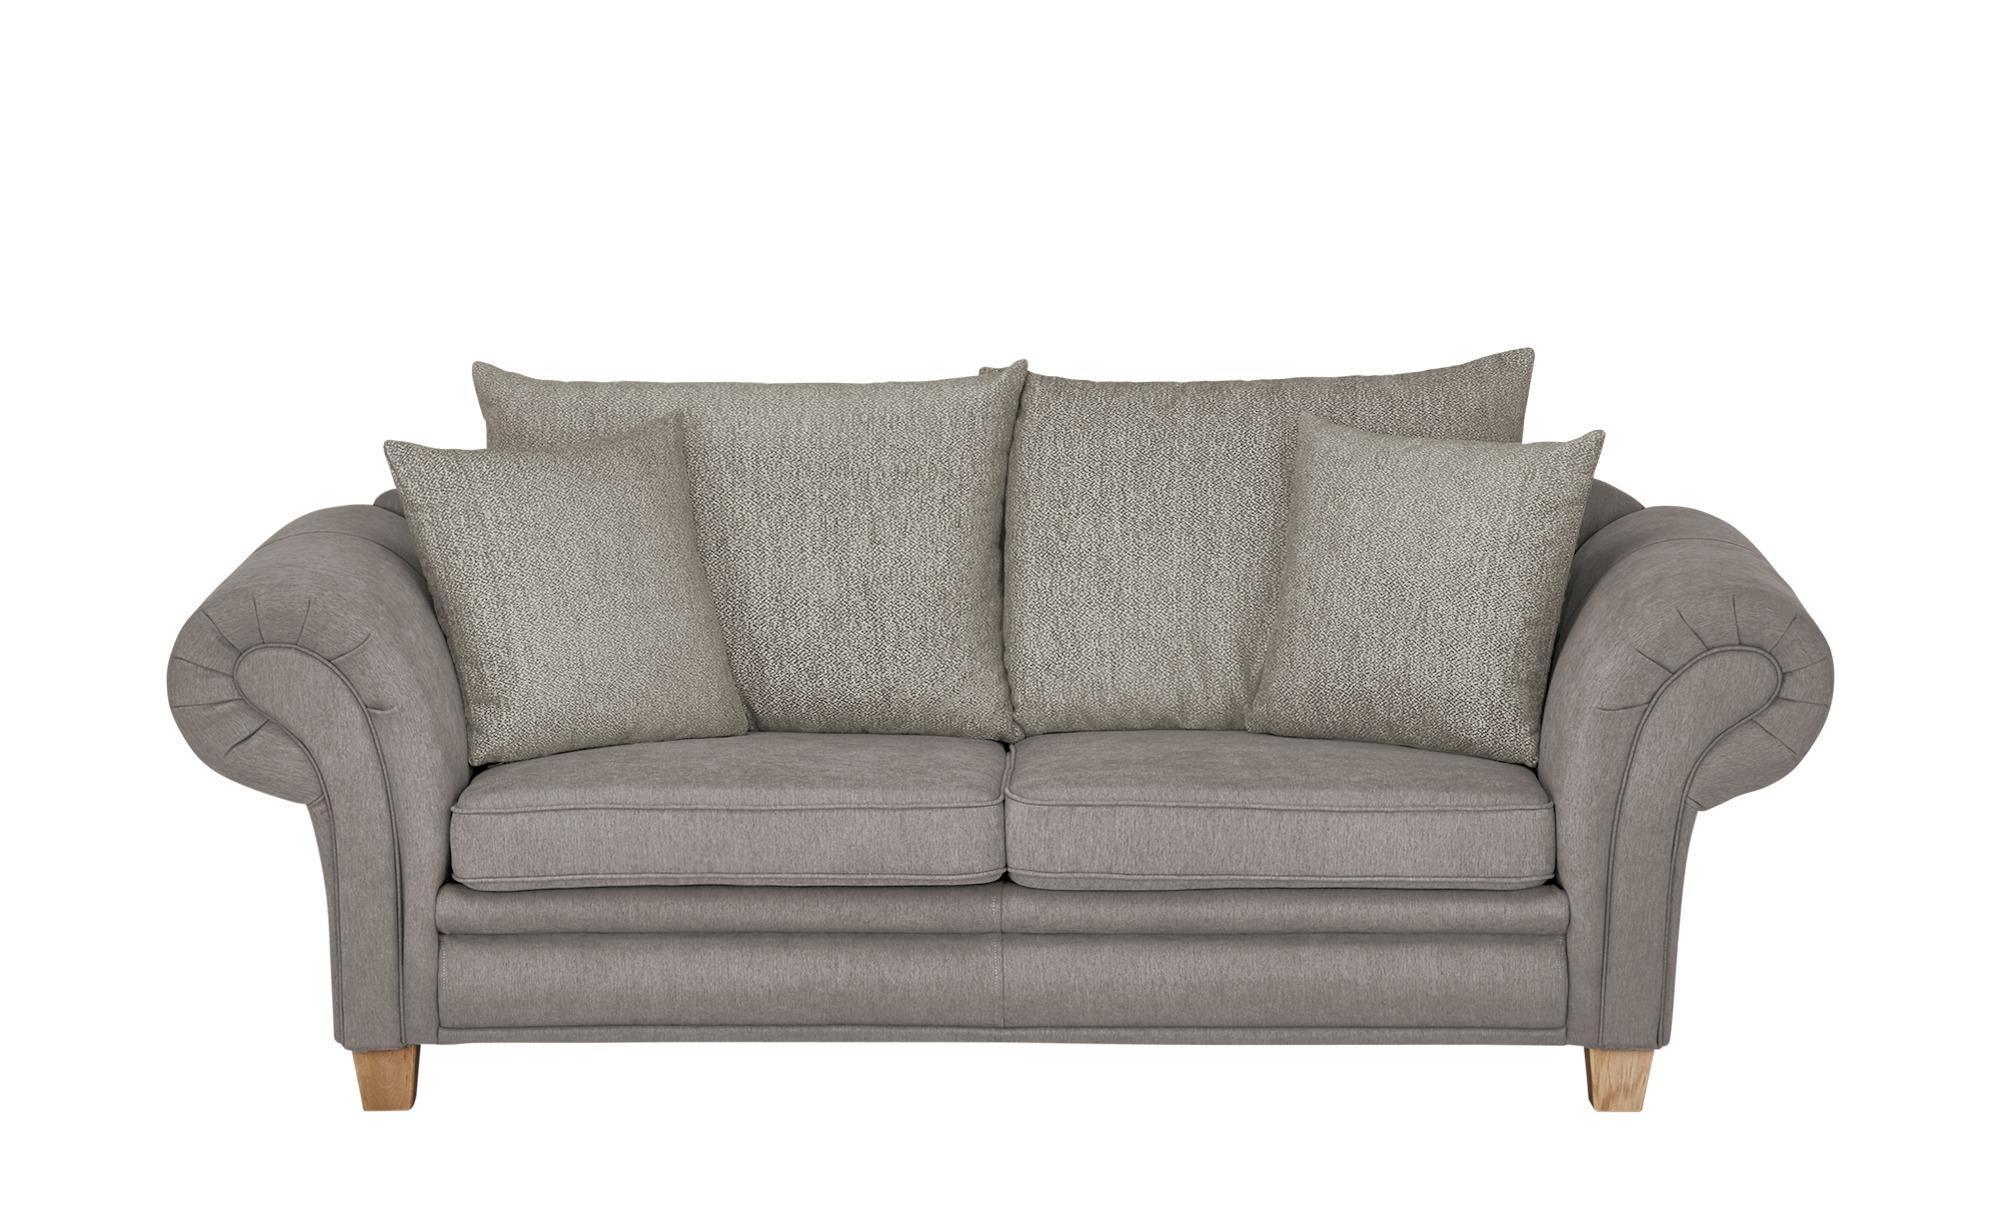 Sofa   Chalet ¦ grau ¦ Maße (cm): B: 218 H: 81 T: 91 Polstermöbel > Sofas > 3-Sitzer - Höffner